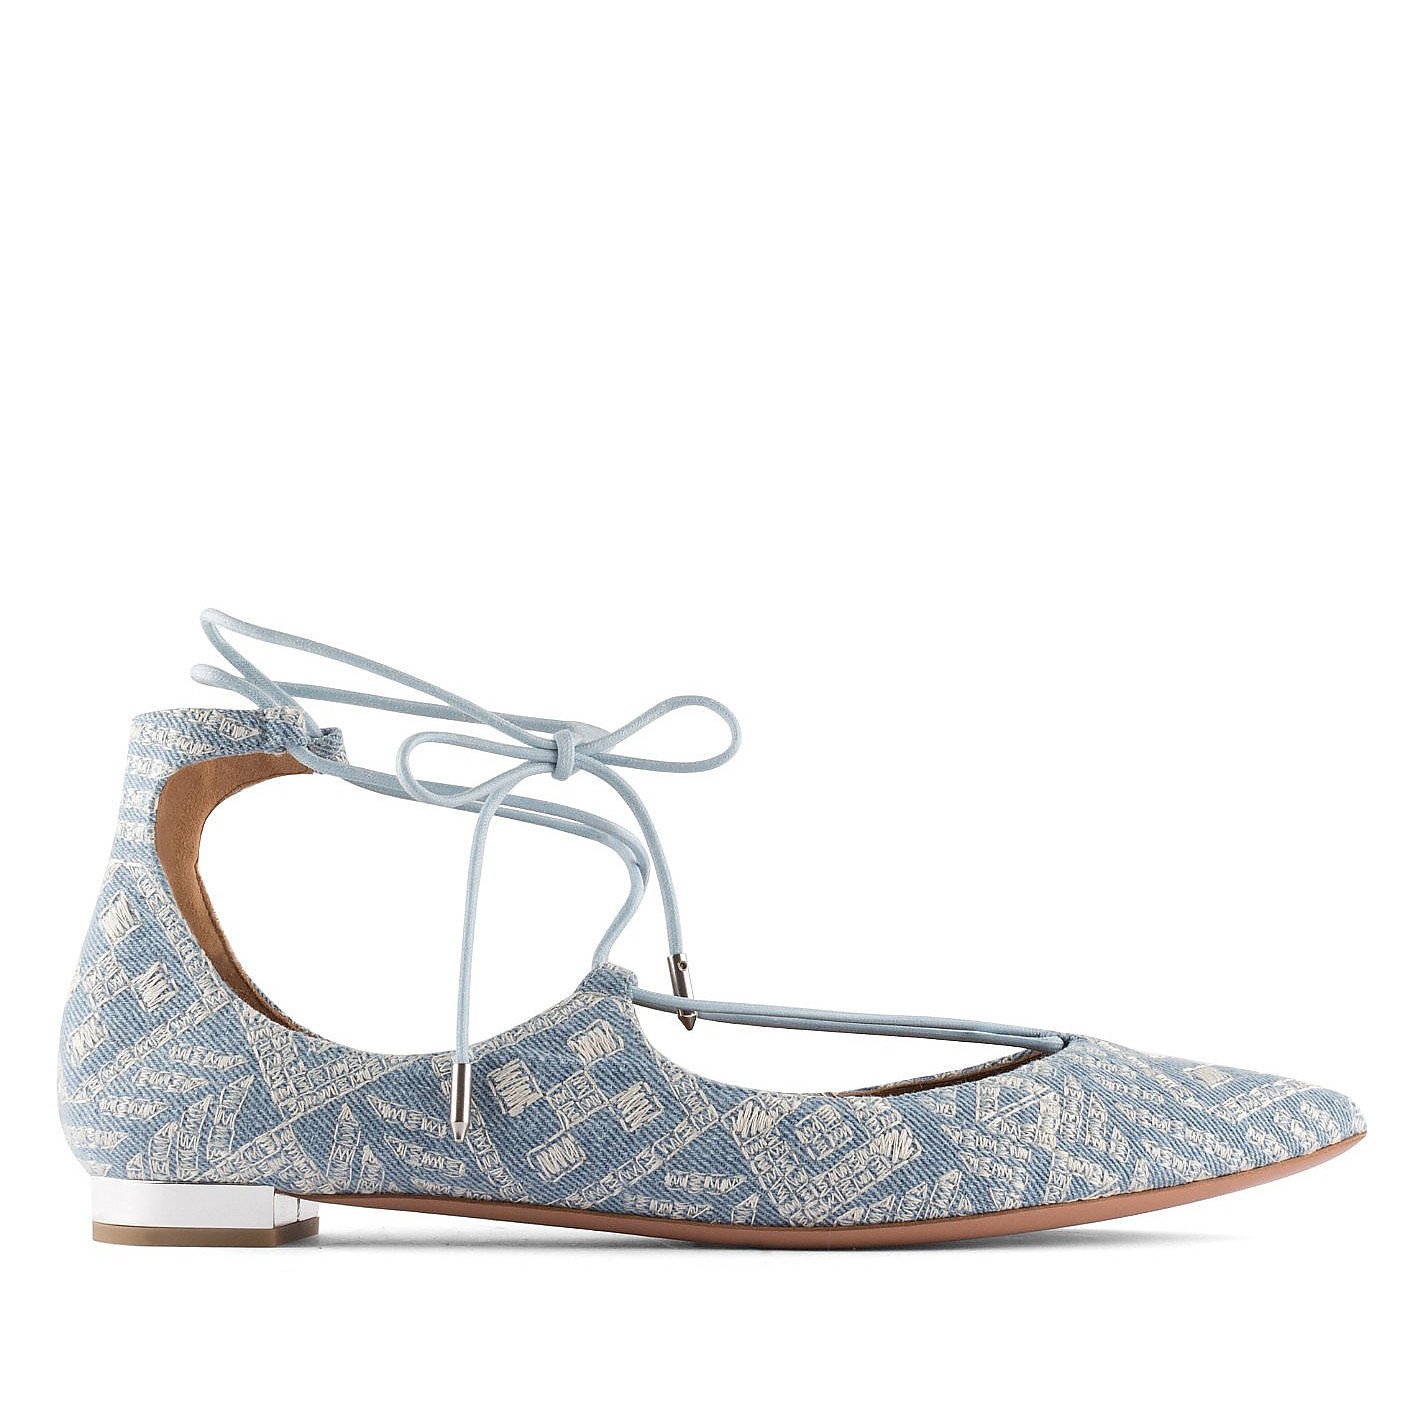 Aquazzura Christy Embroidered Flat